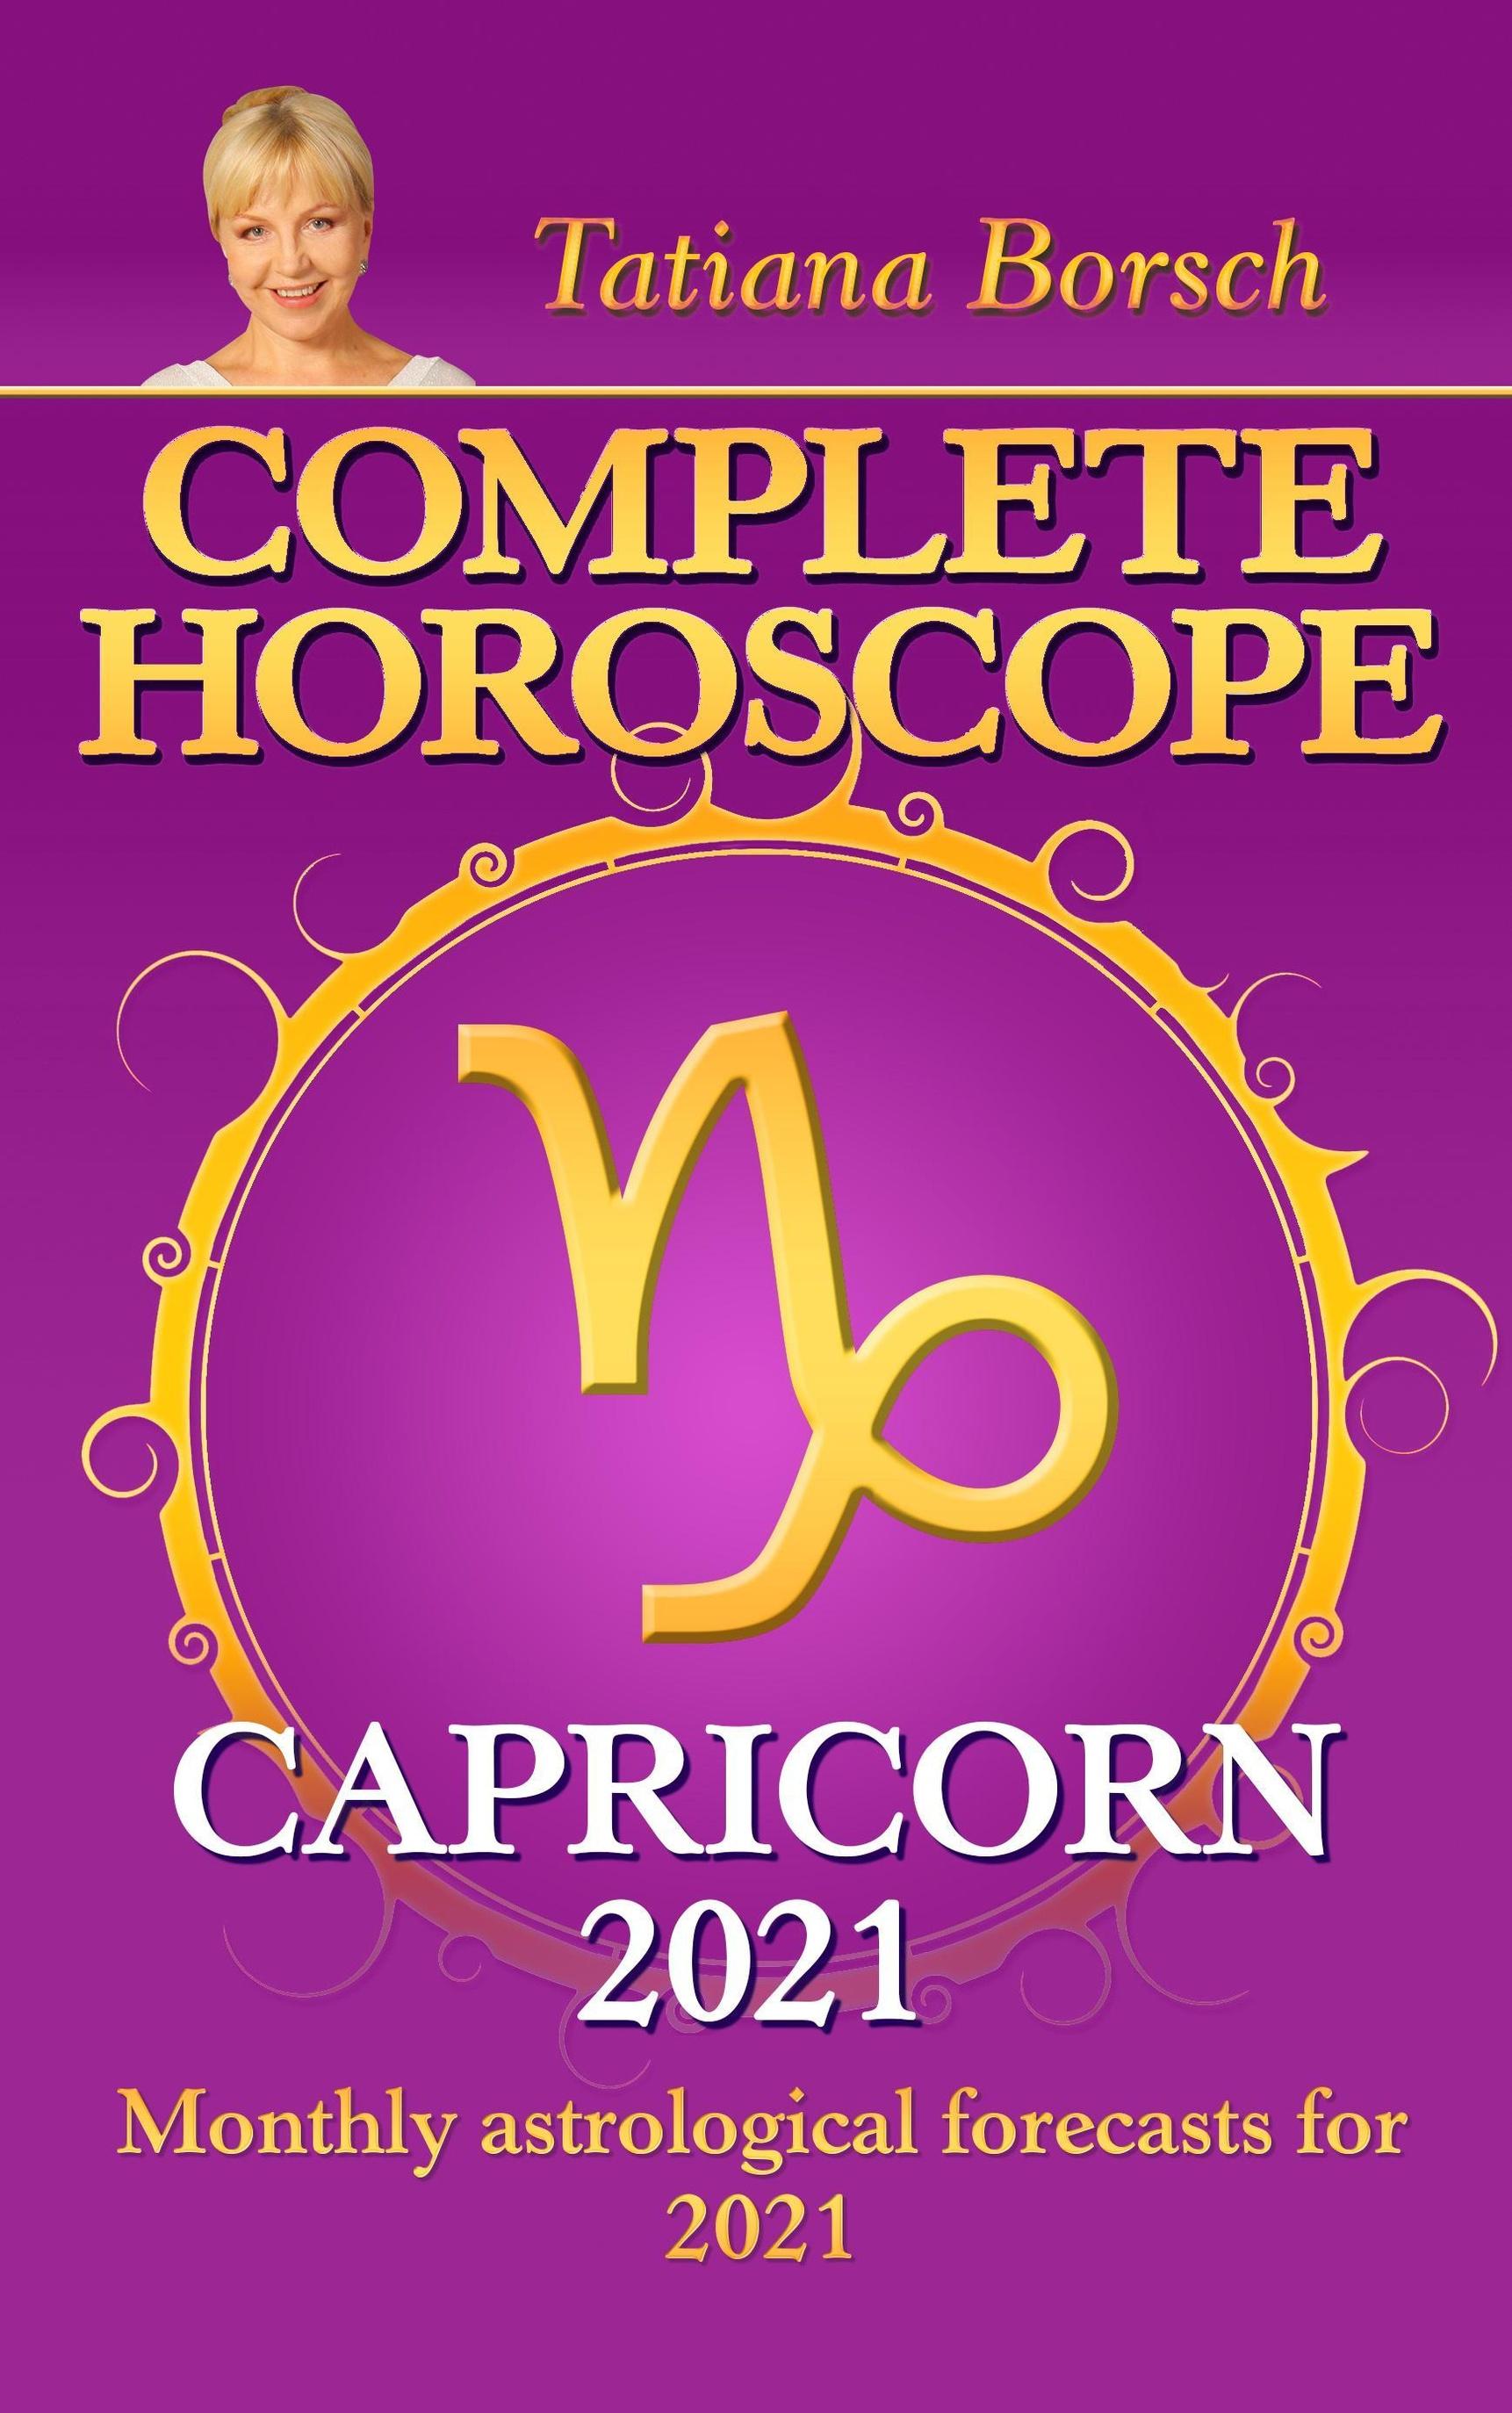 Complete Horoscope Capricorn 20 ebook jetzt bei Weltbild.de